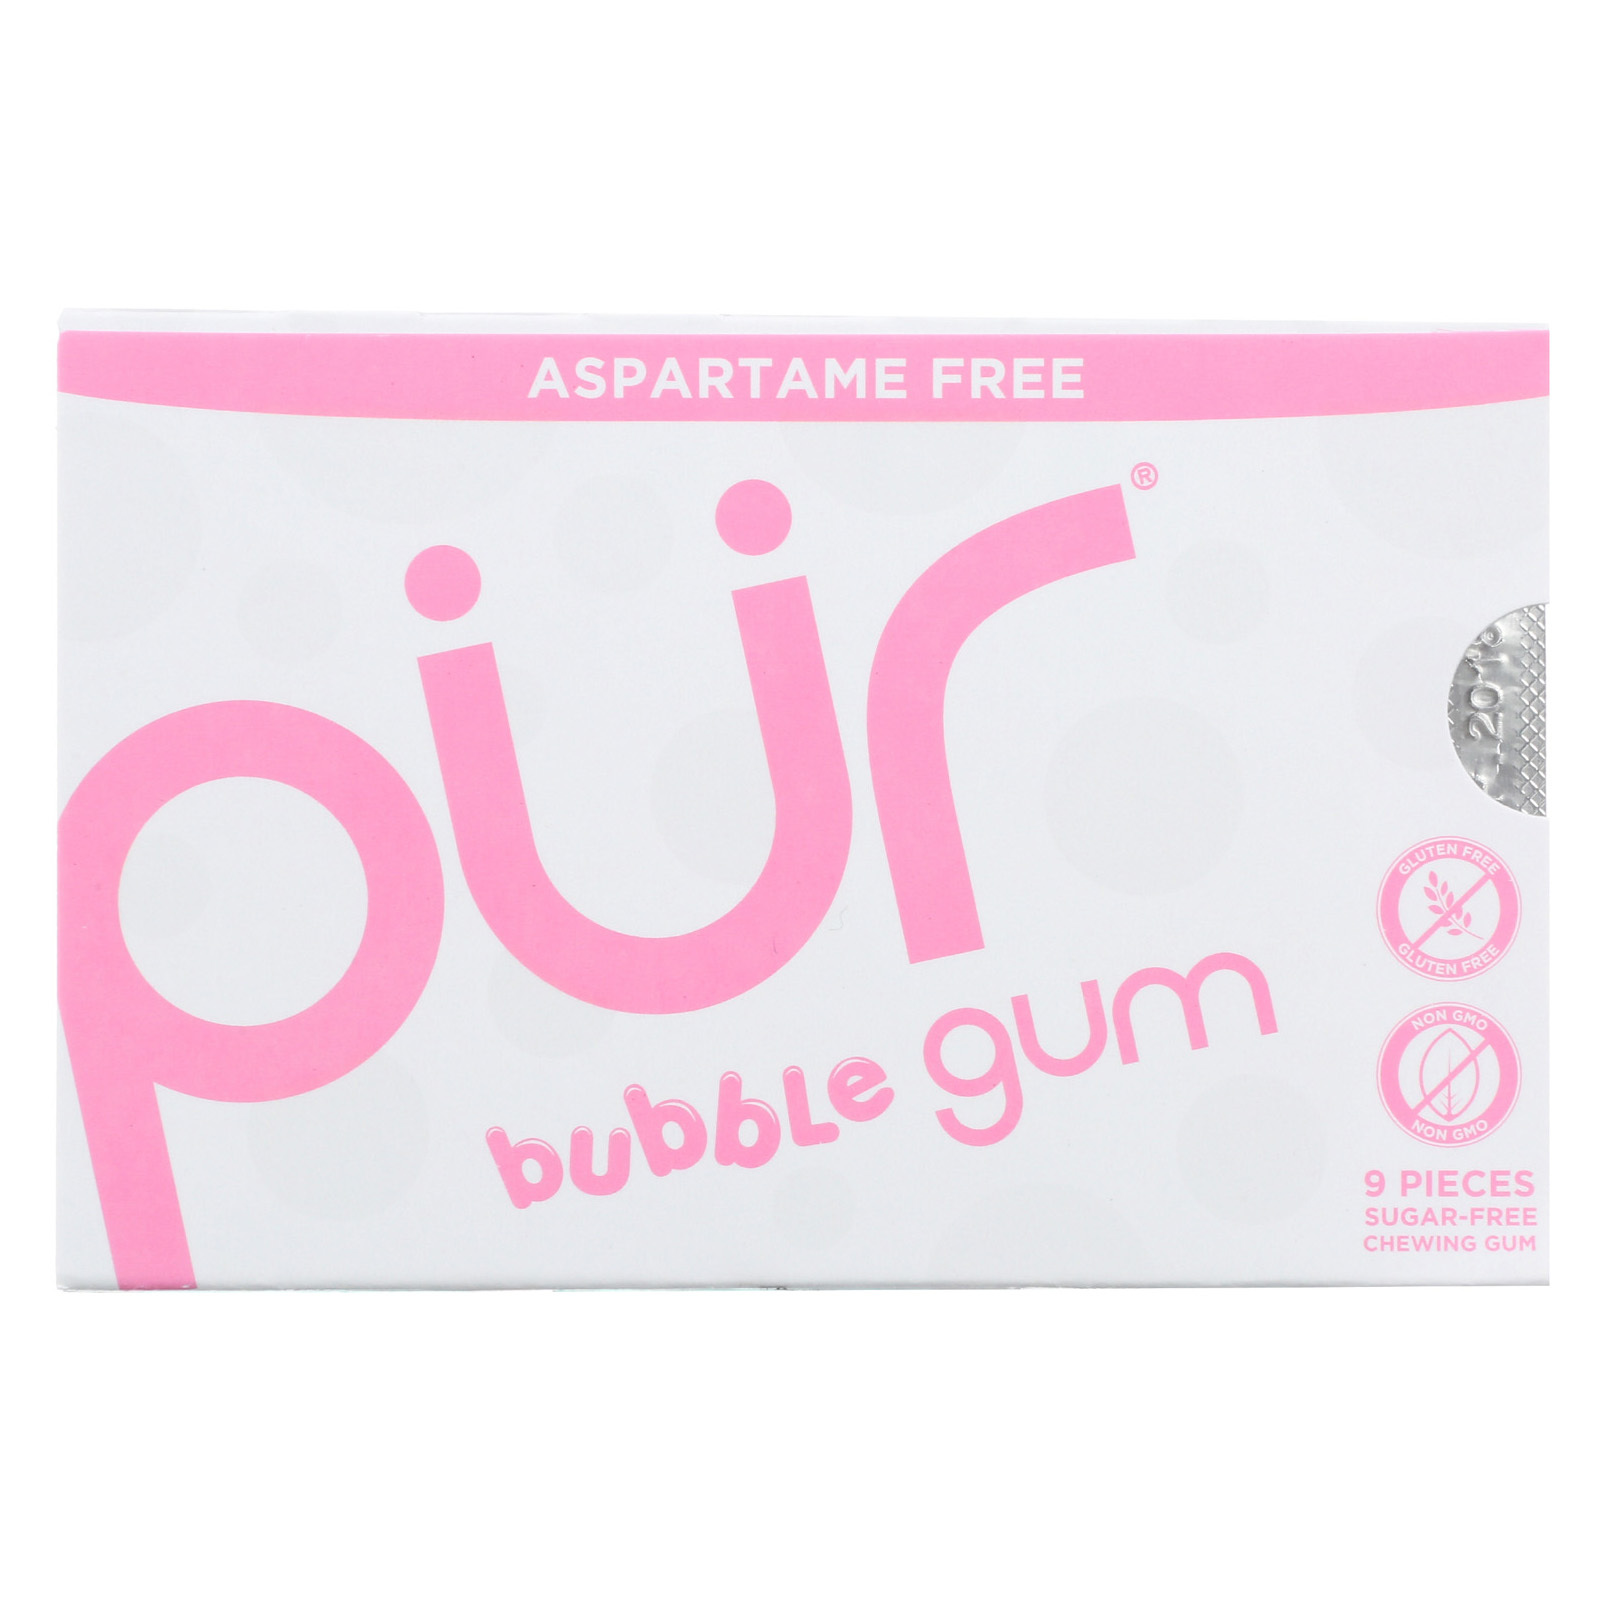 Pur Gum Bubble Gum - Sugar Free - Case of 12 - 9 count